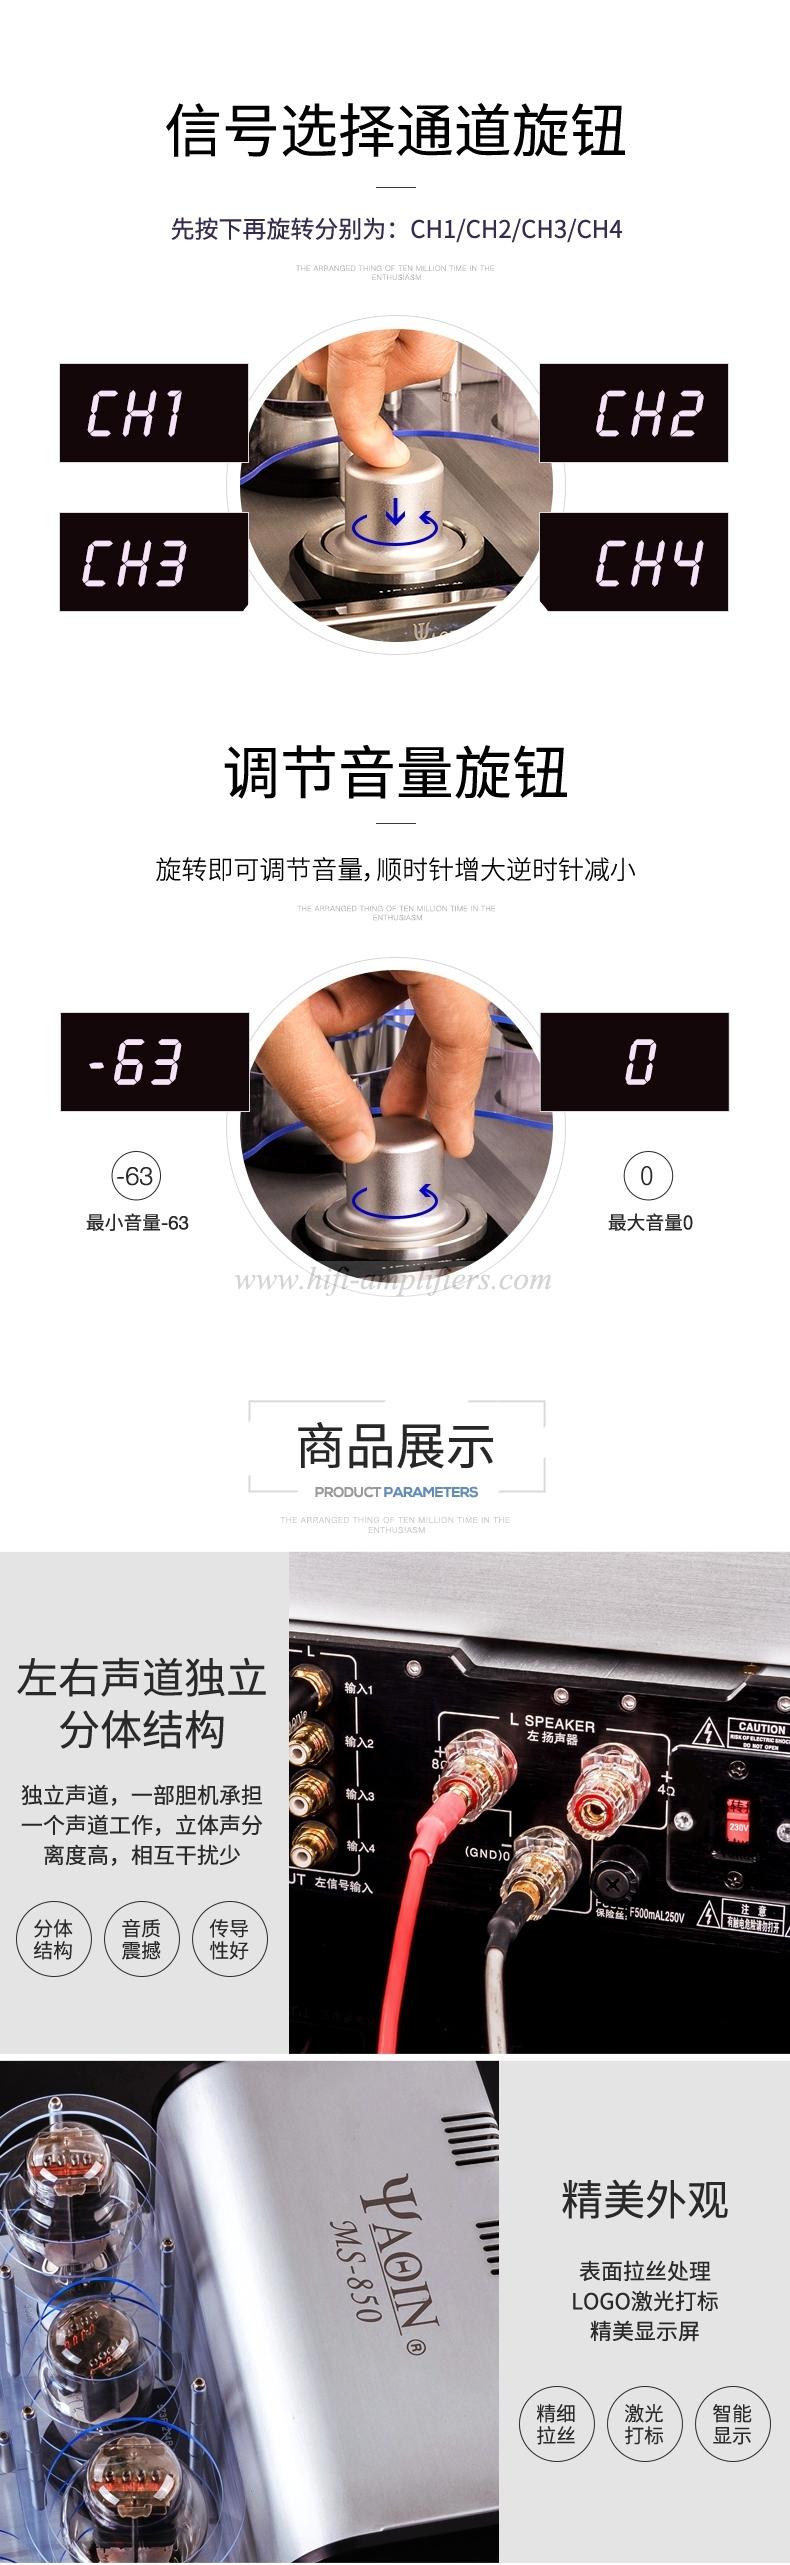 YAQIN MS-850 Class A Tube Amp HiFi Rectifier push-pull Amplifier Pair